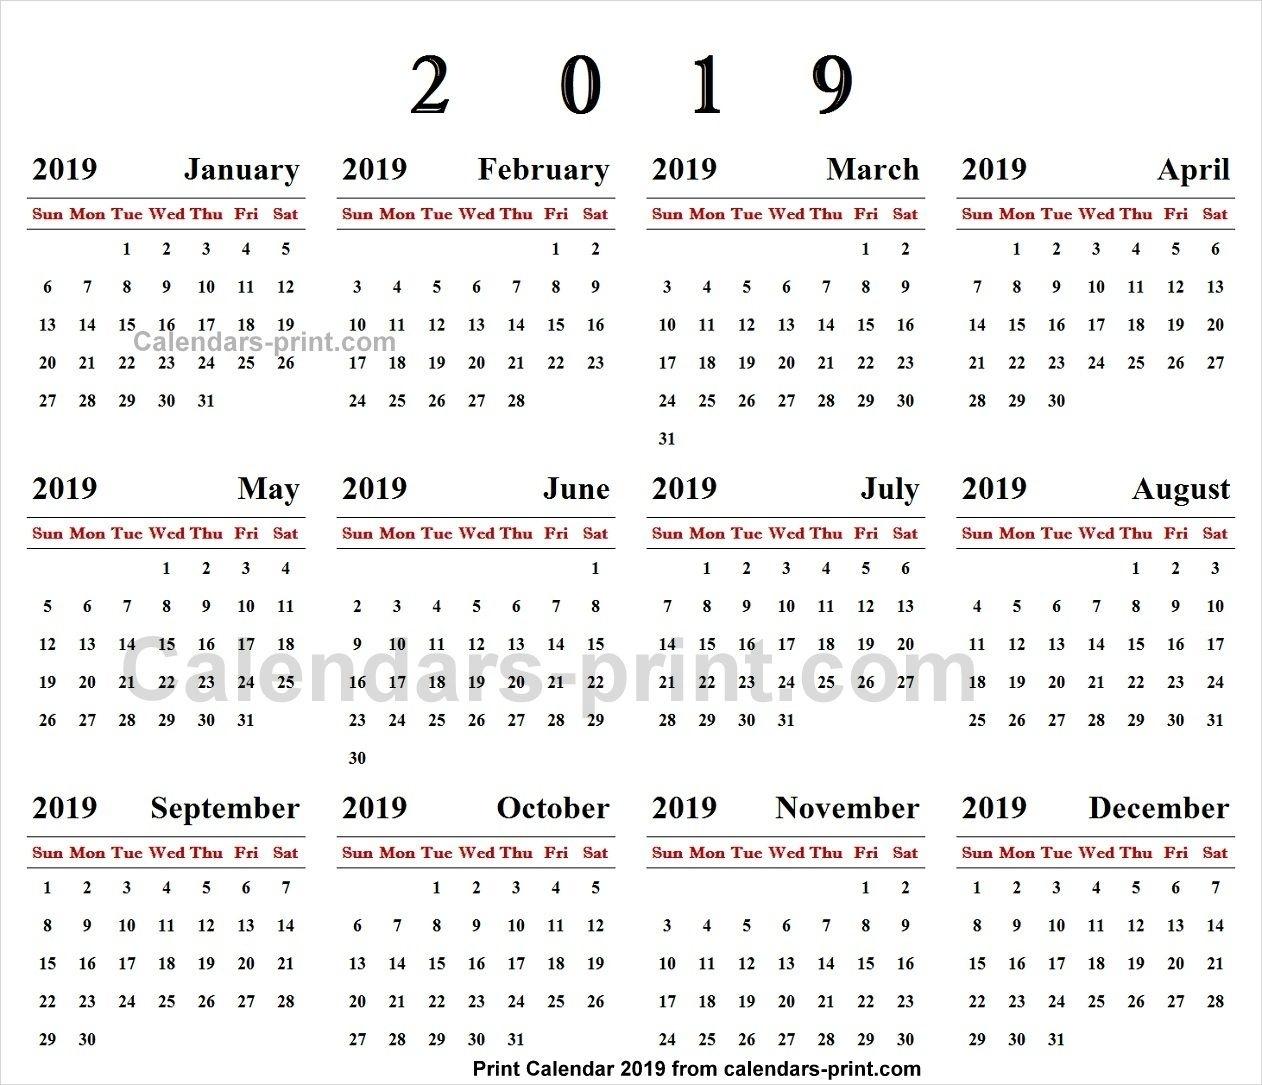 Online Calendar 2019 | 2019 Yearly Calendar | Online Calendar_Calendar 2019 Printing Online